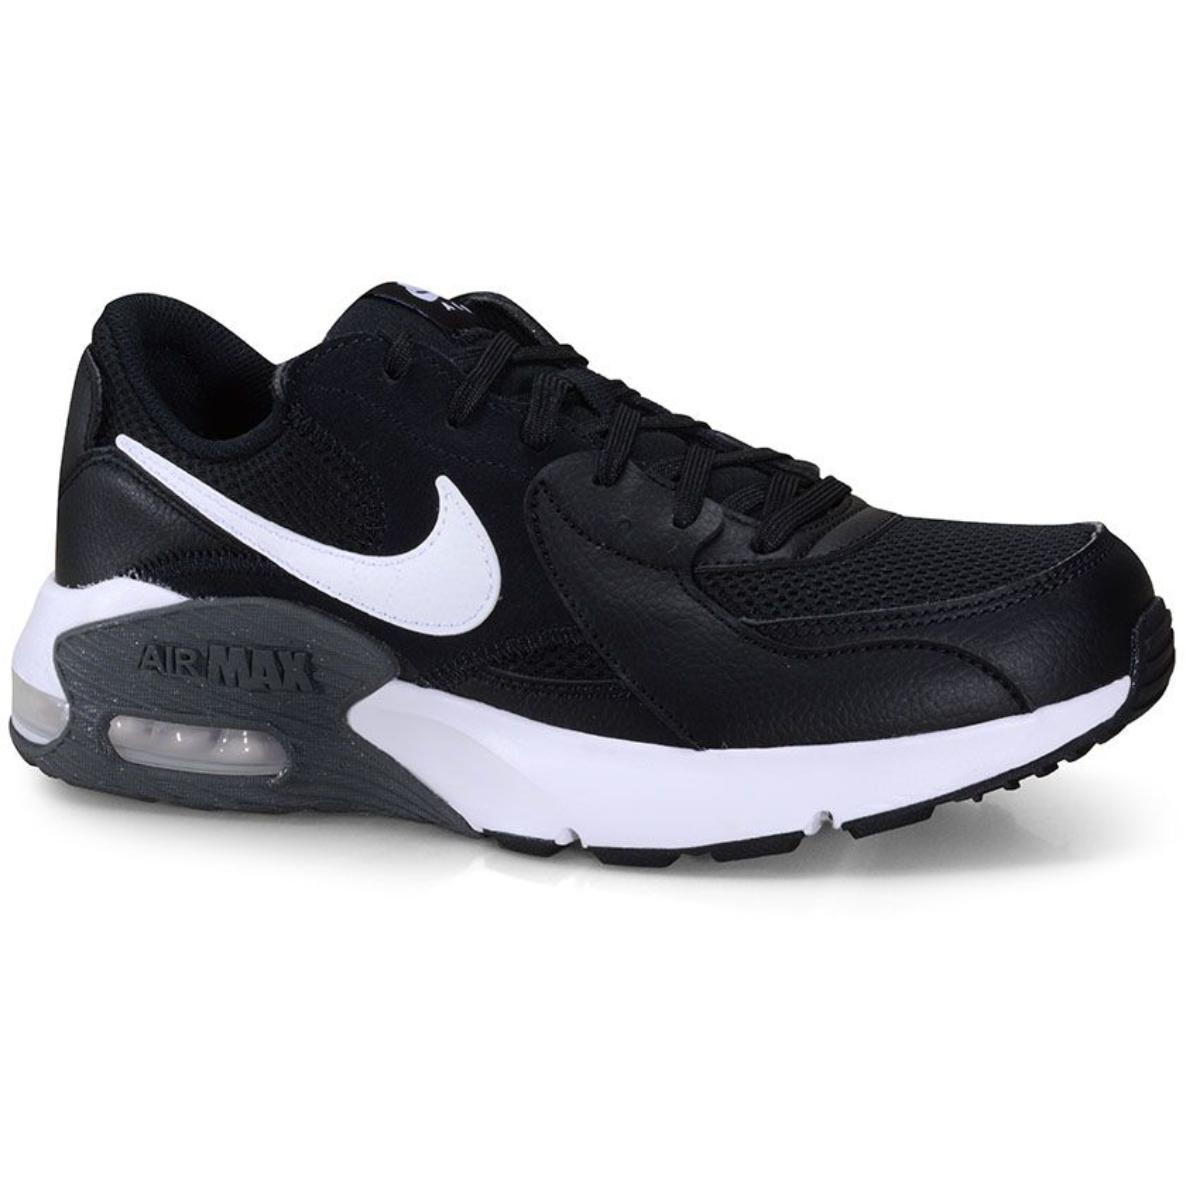 Tênis Masculino Nike Cd4165-001 Air Max Excee Preto